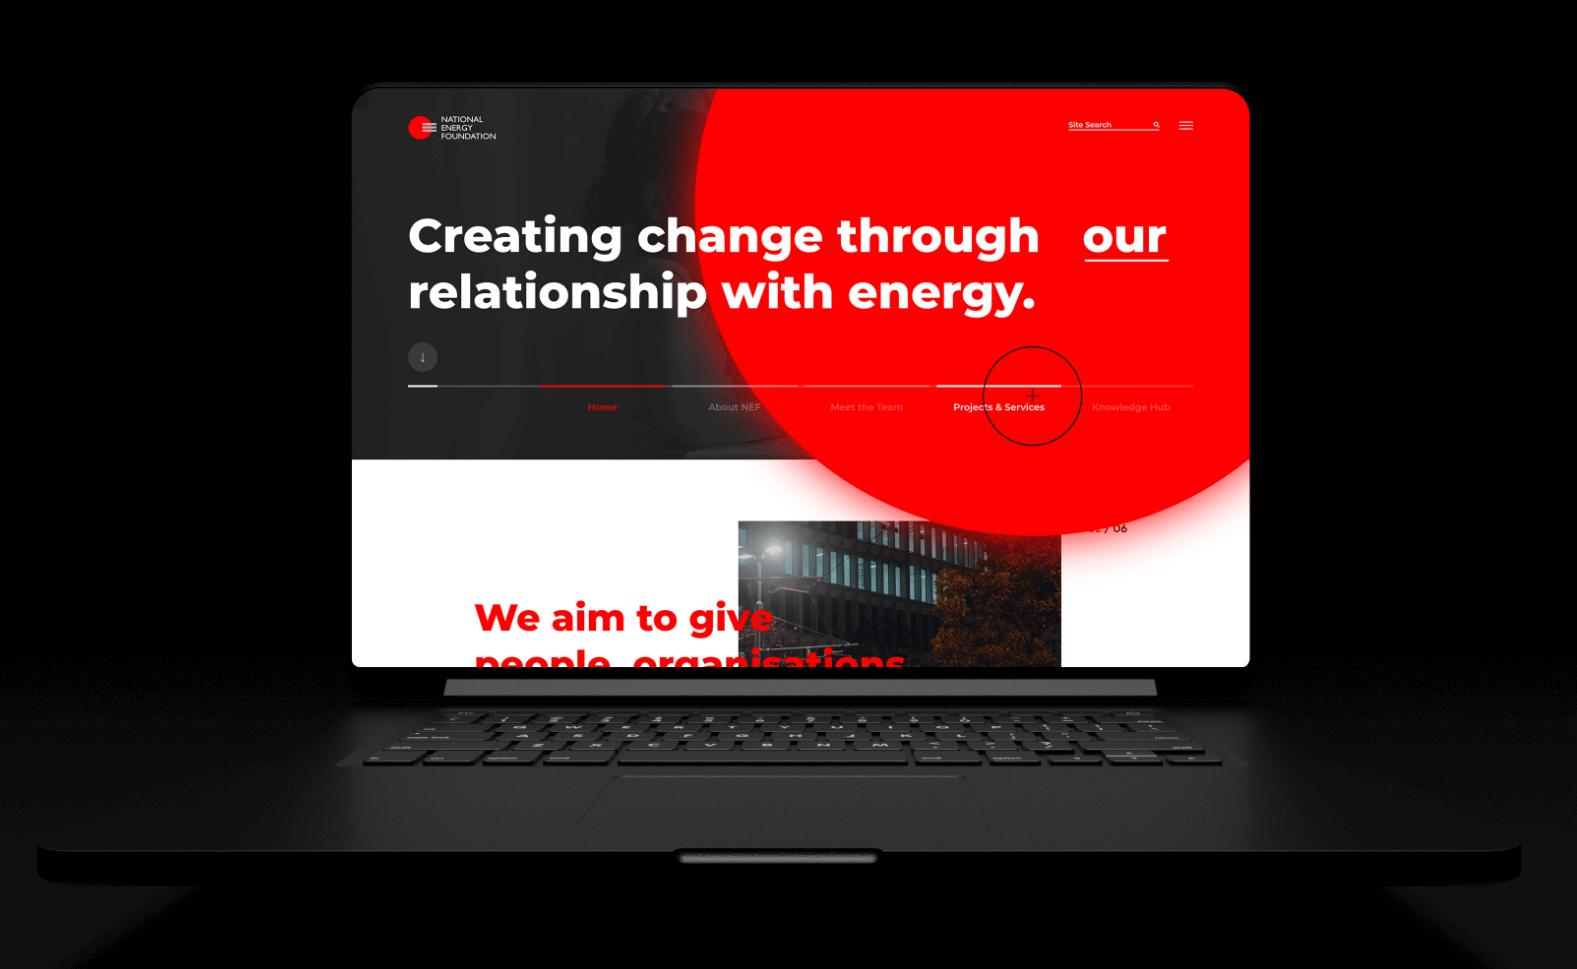 The National Energy Foundation